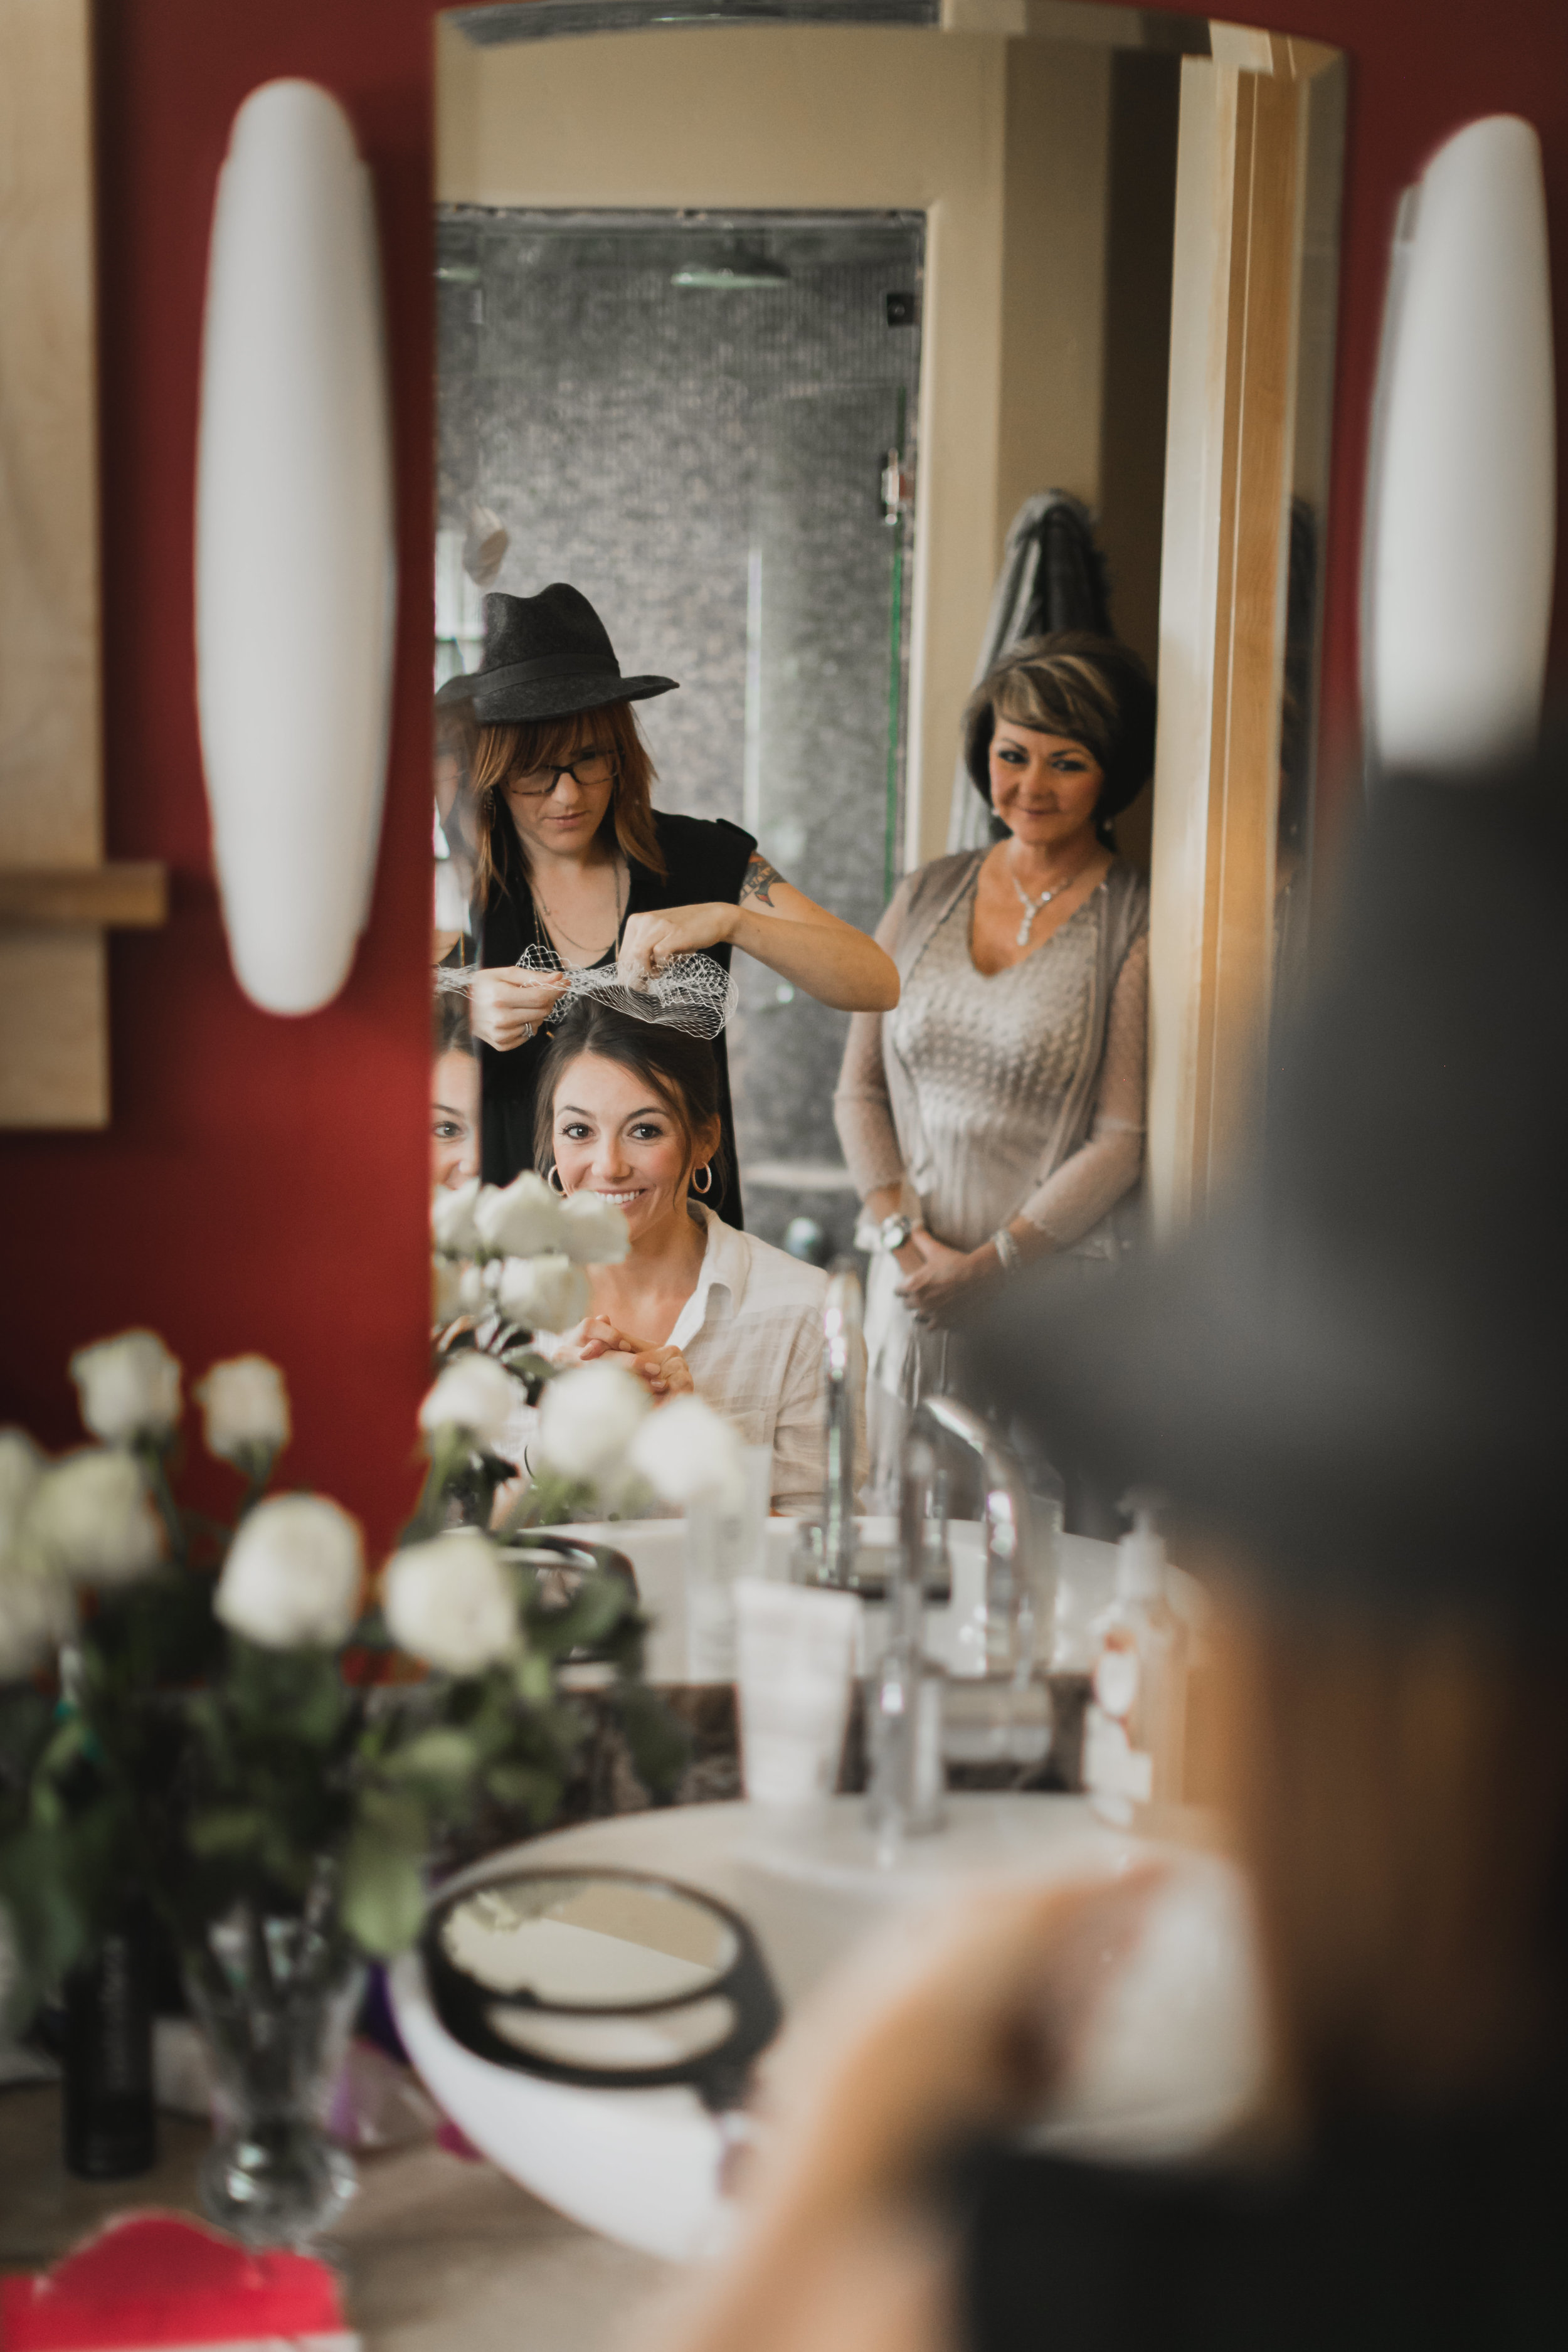 vild-photography-photographer-colorado-intimate-wedding-adventure-Stephanie- Adam-151.jpg